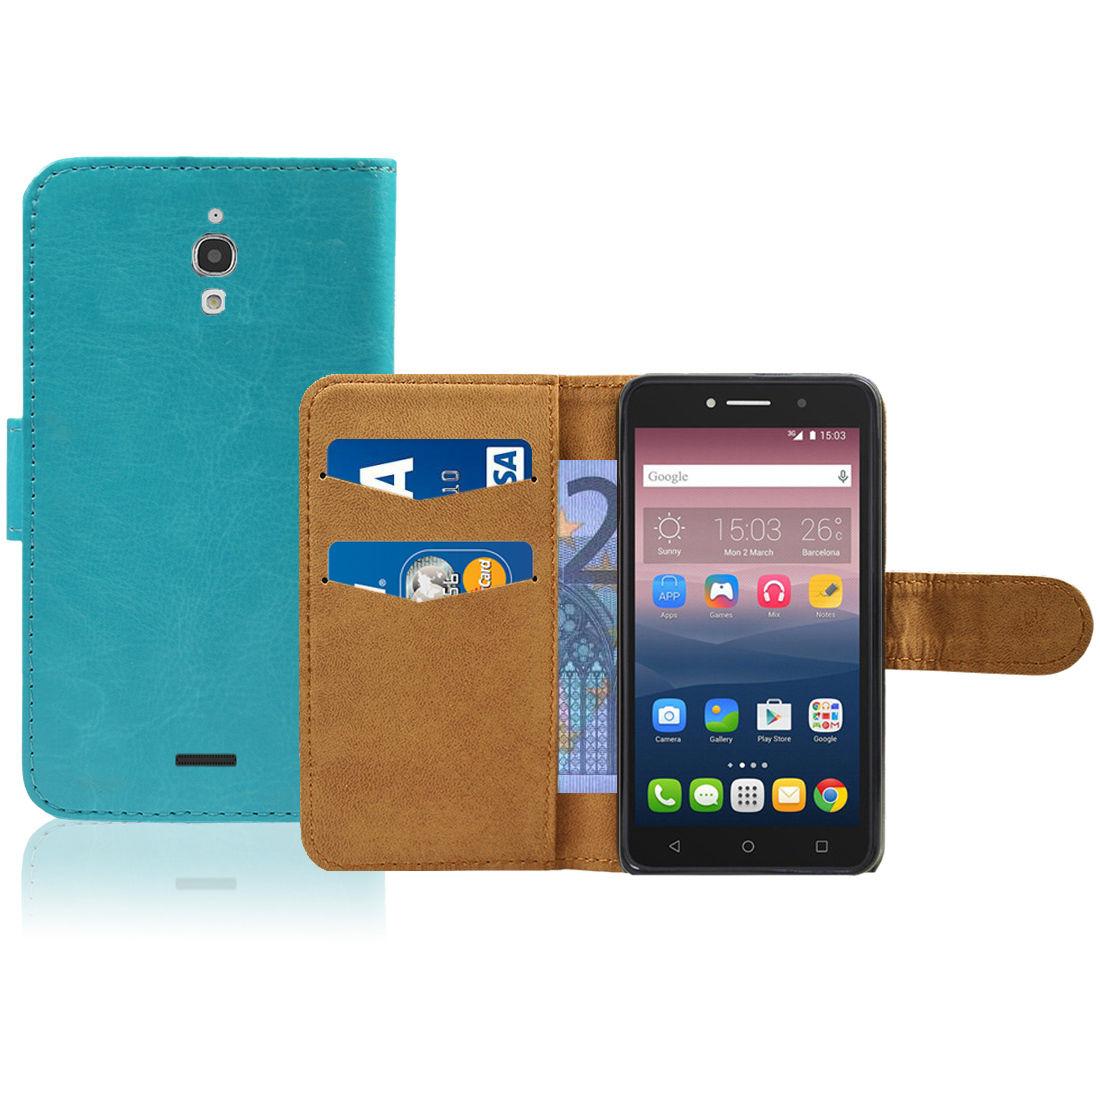 Pouzdro pro Alcatel Pixi 4 (6) 4G modré